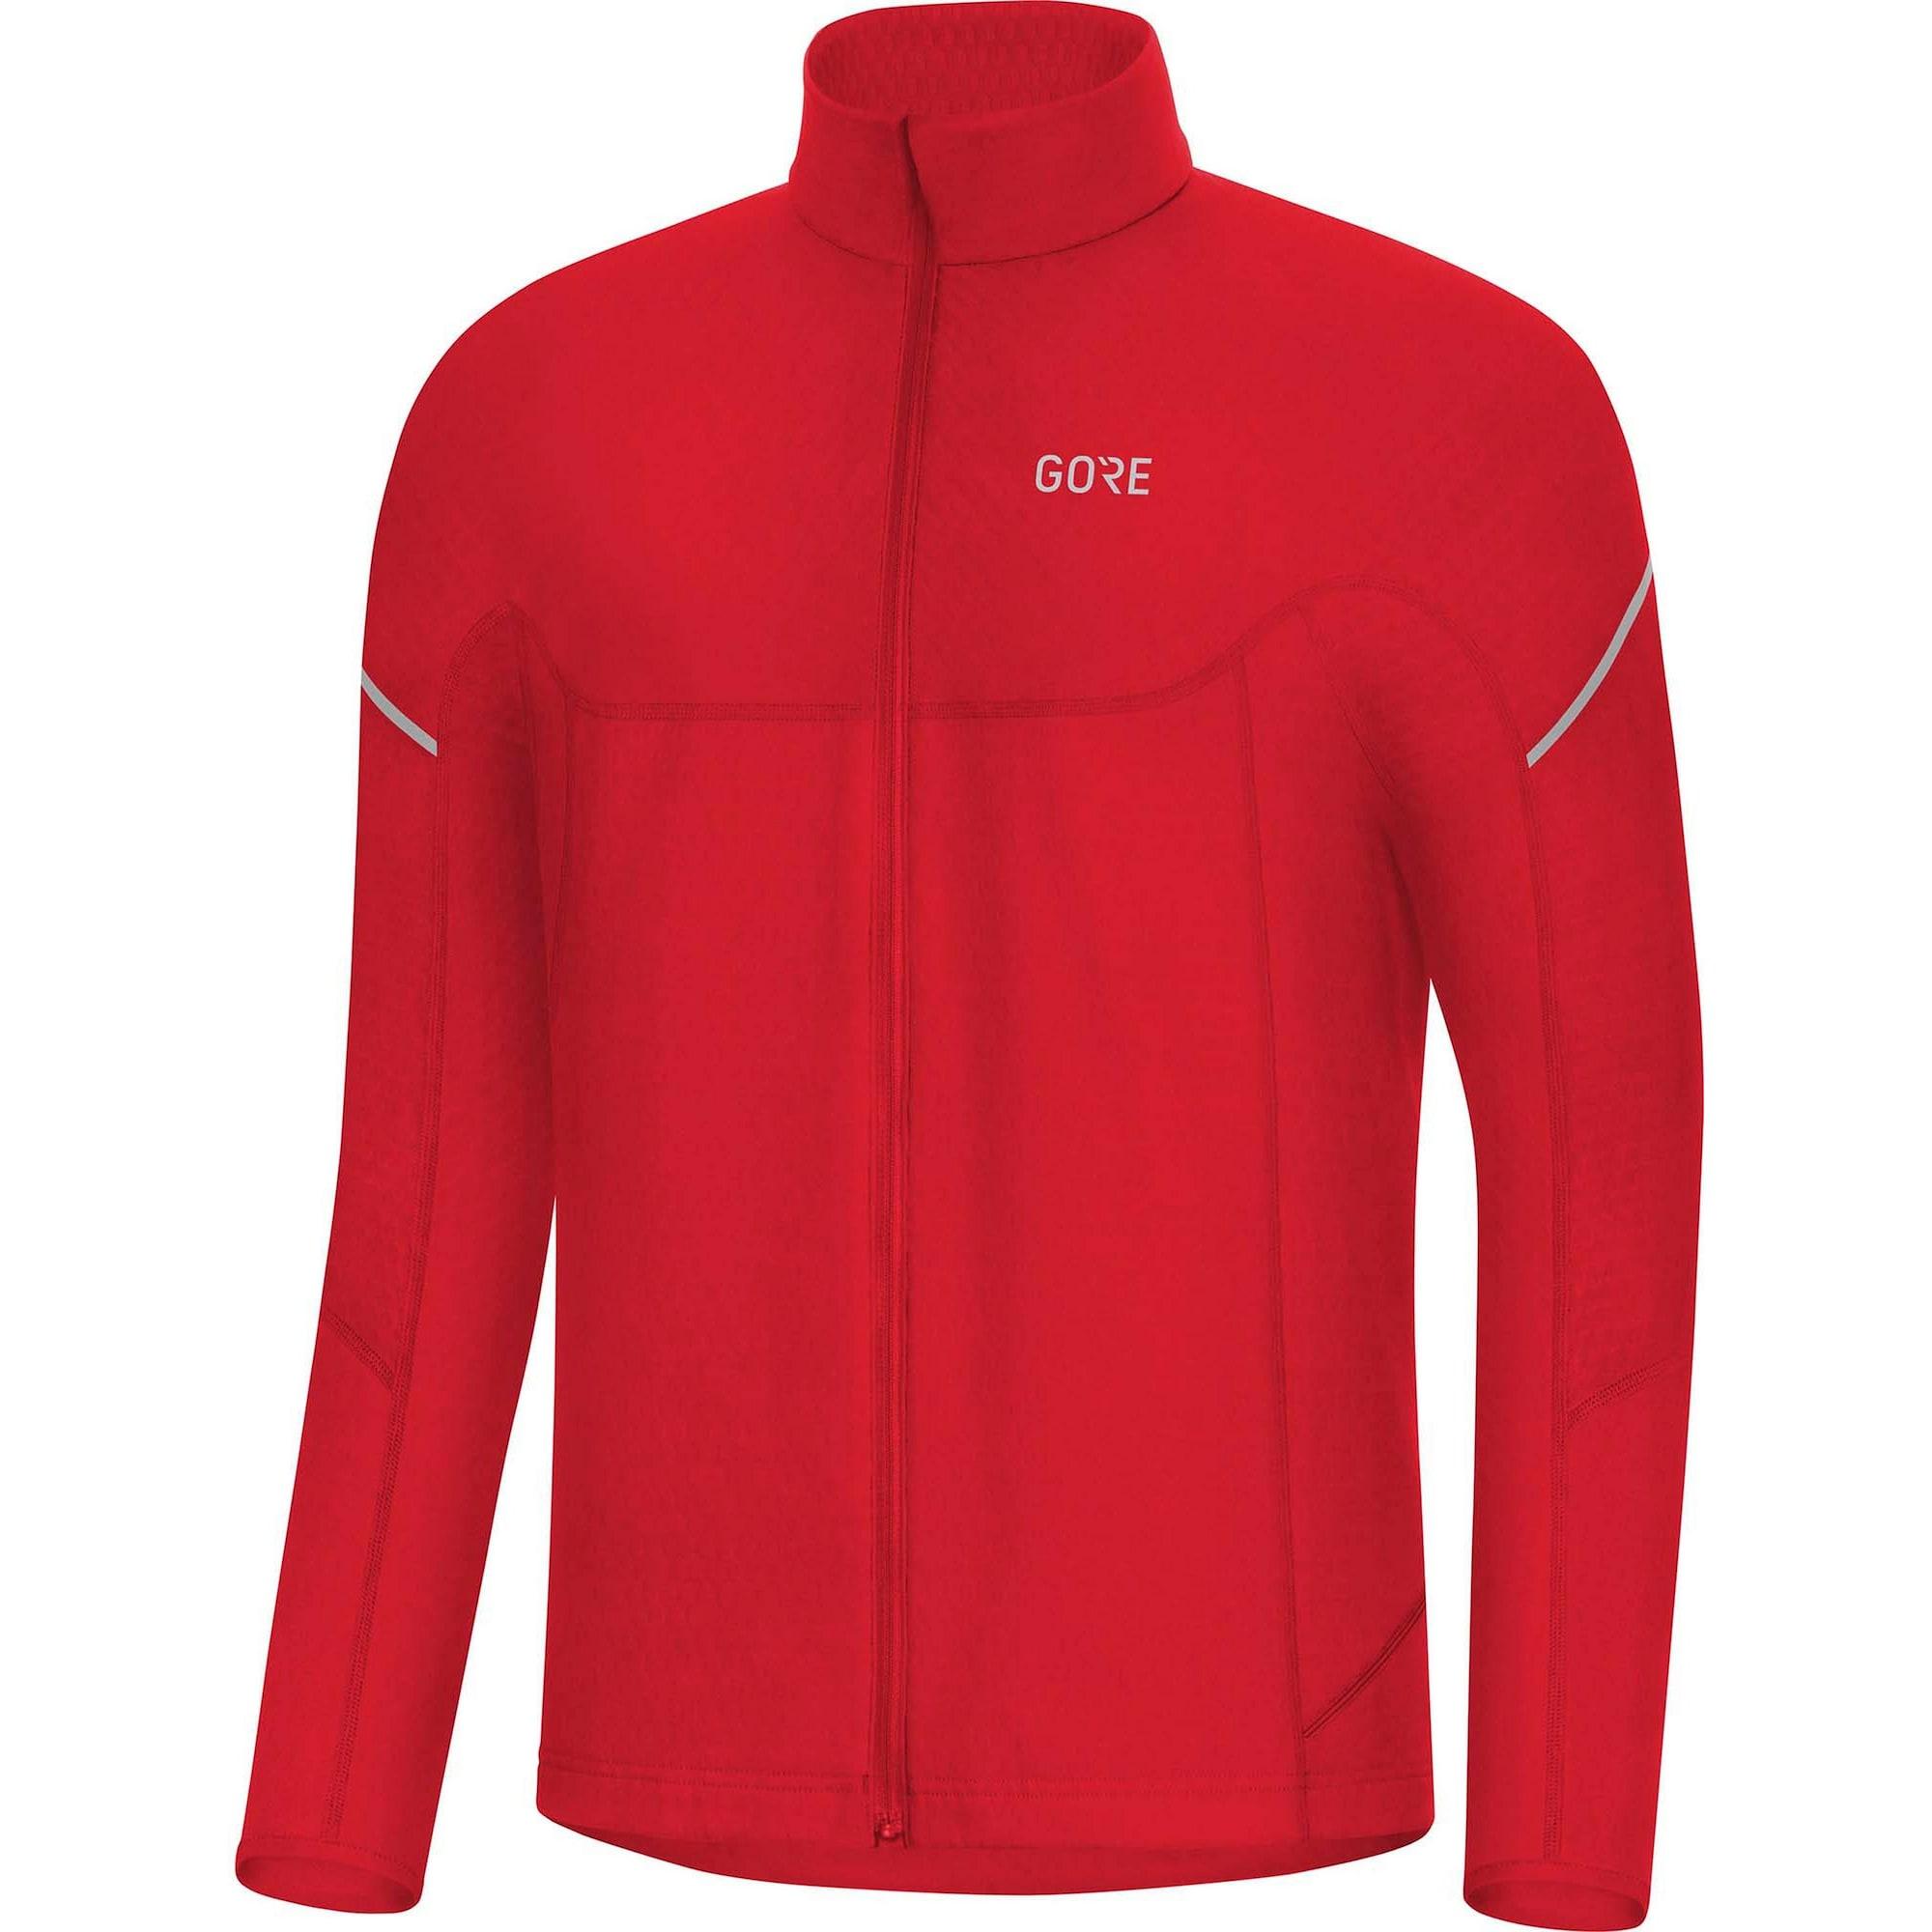 Fahrradtrikot 'M Thermo Zip' | Sportbekleidung > Trikots > Fahrradtrikots | Rot | GORE WEAR